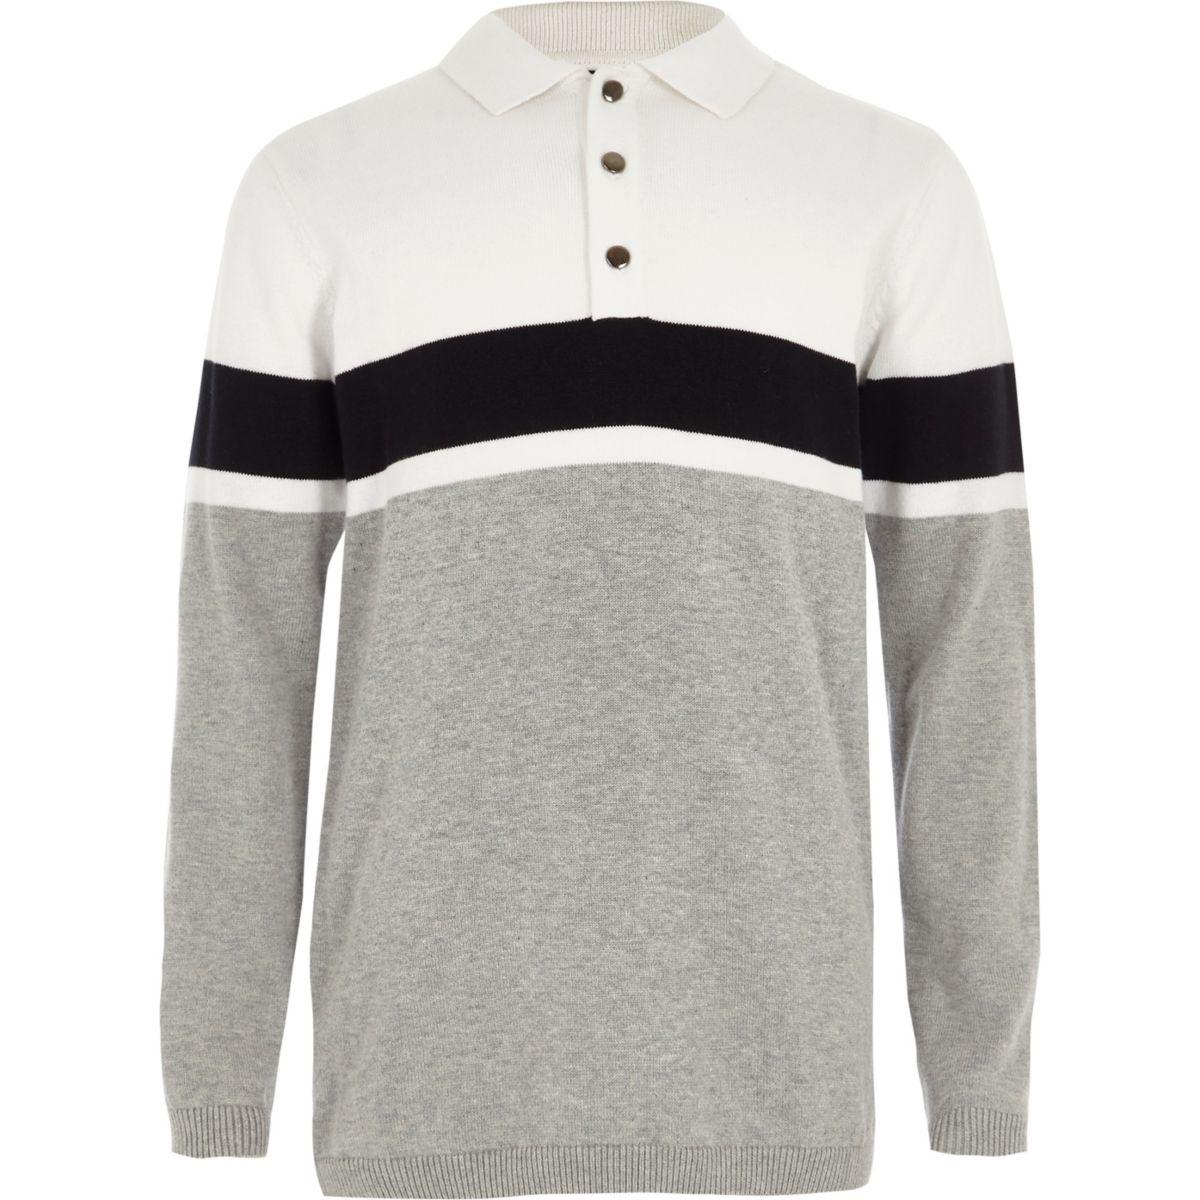 Boys white block stripe knit rugby shirt